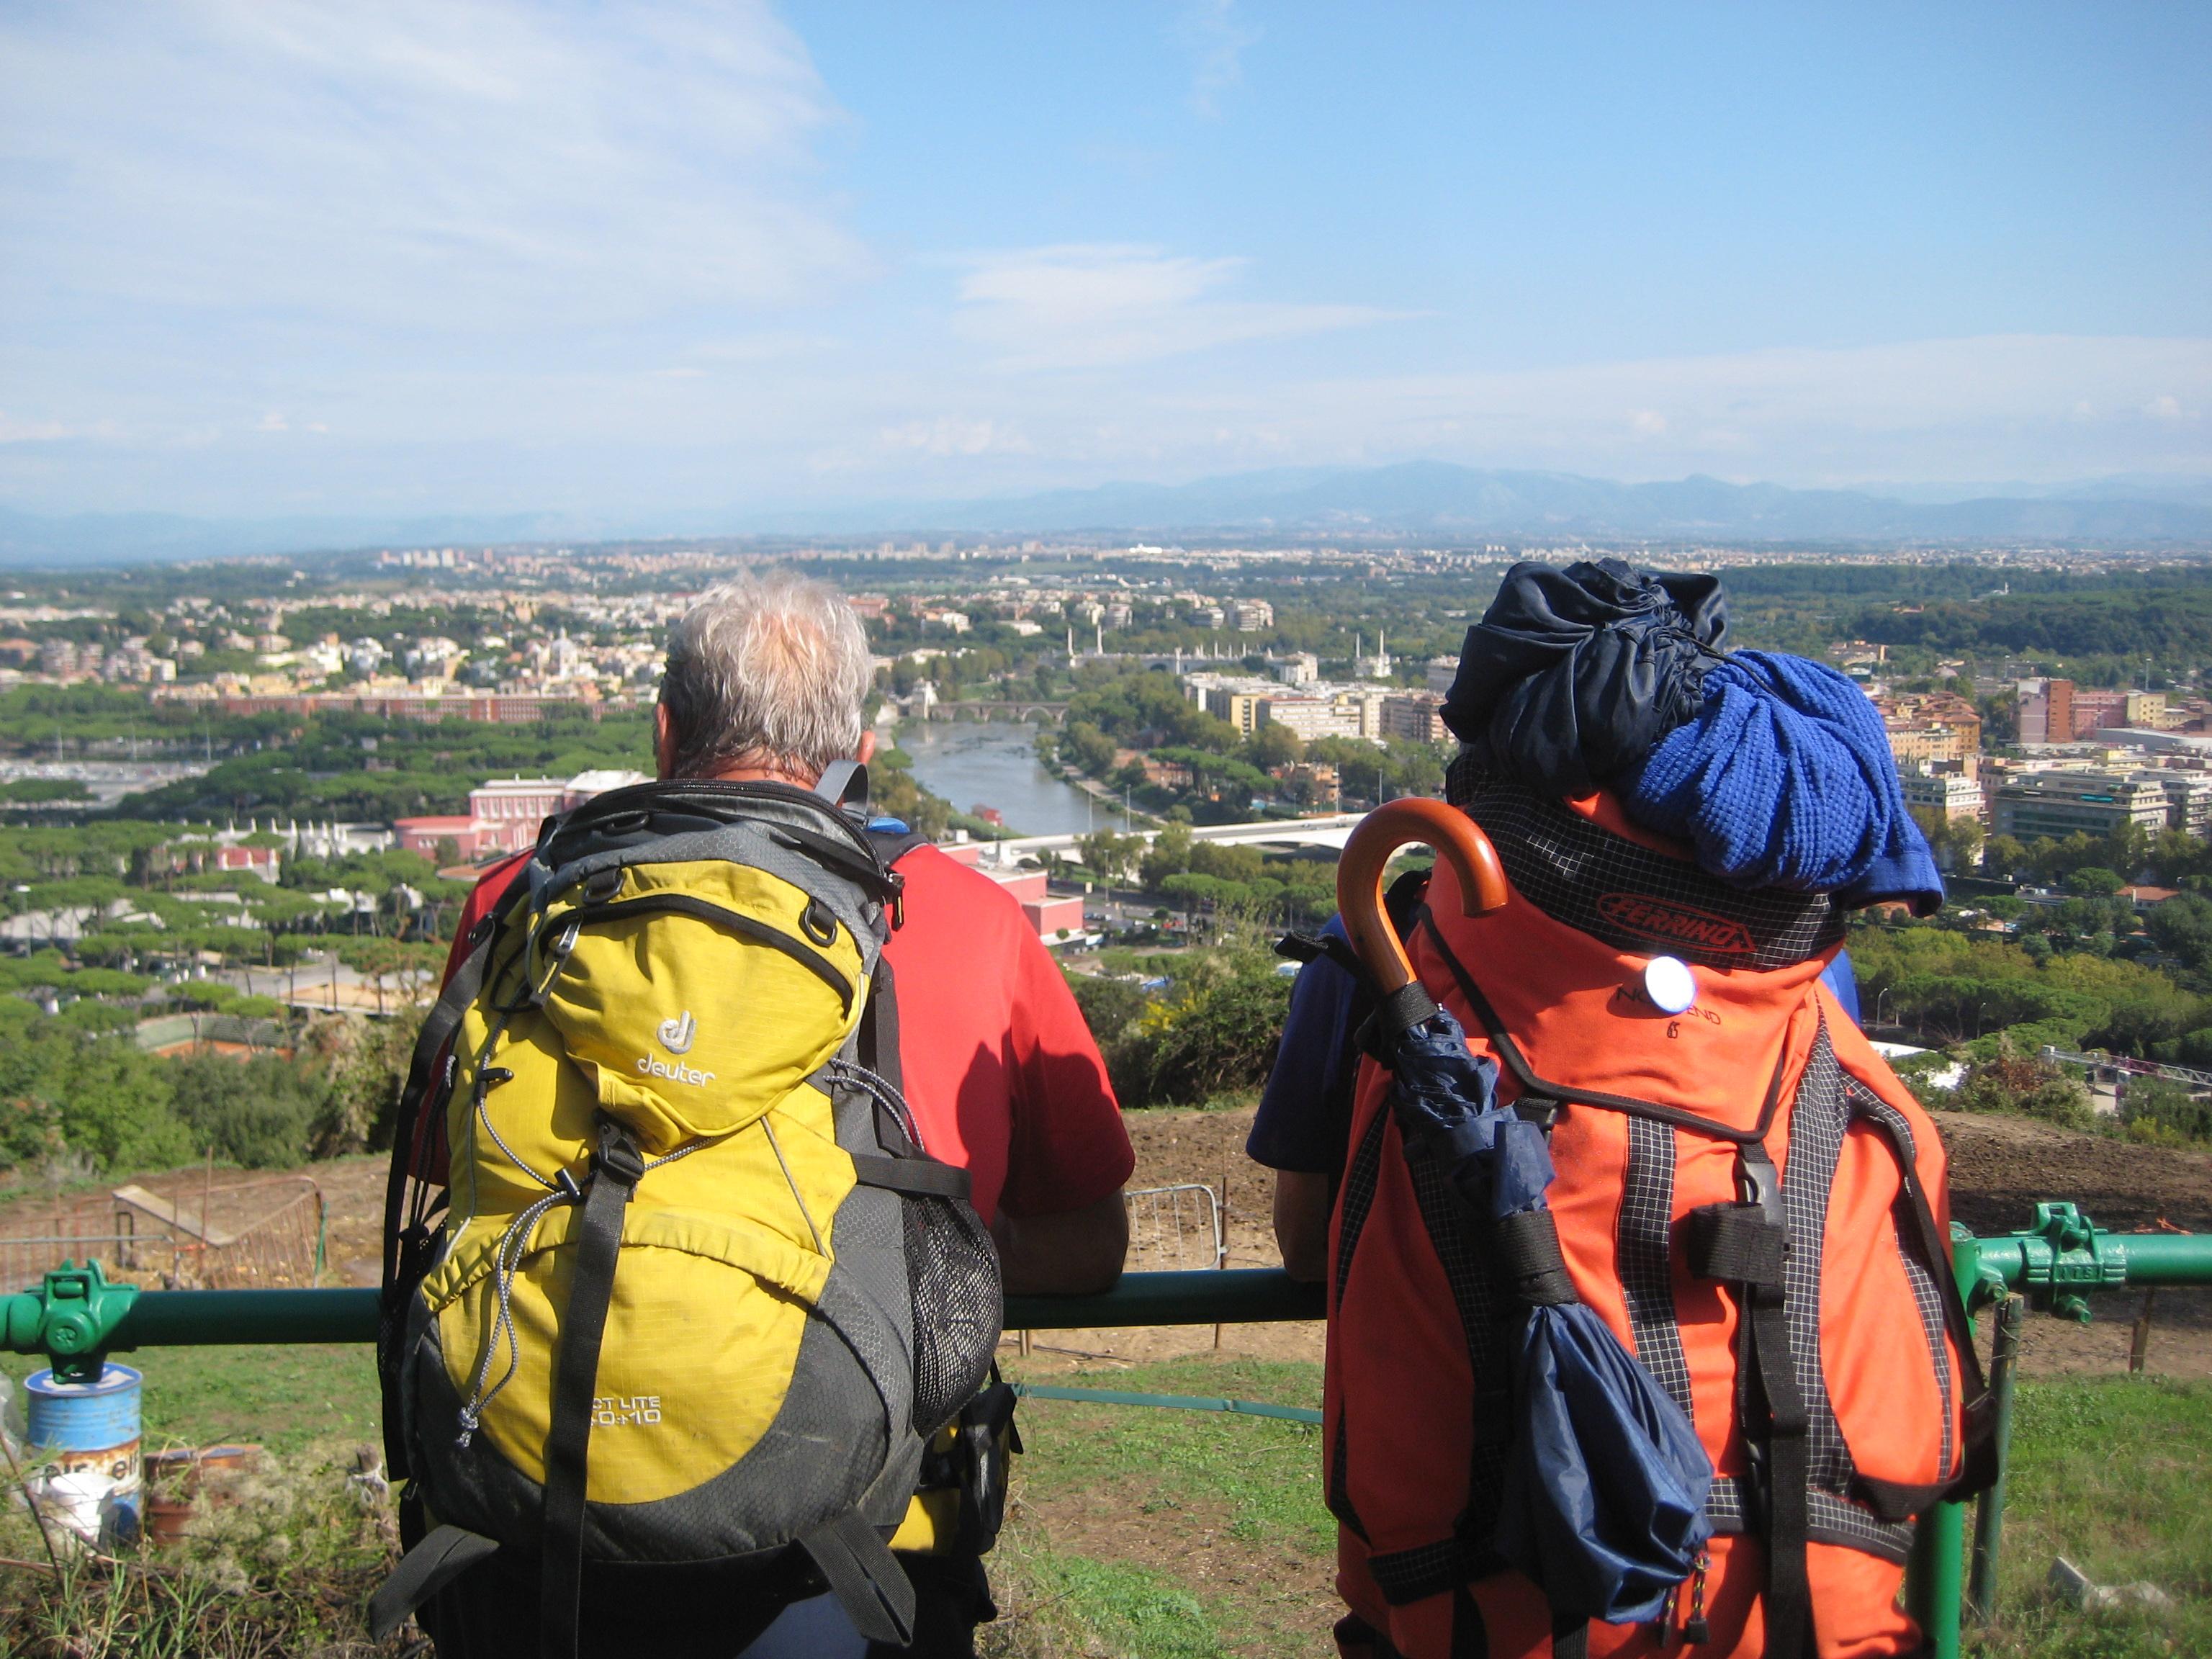 La Via Francigena a puntate: l'ultima fatica, da Viterbo a Roma